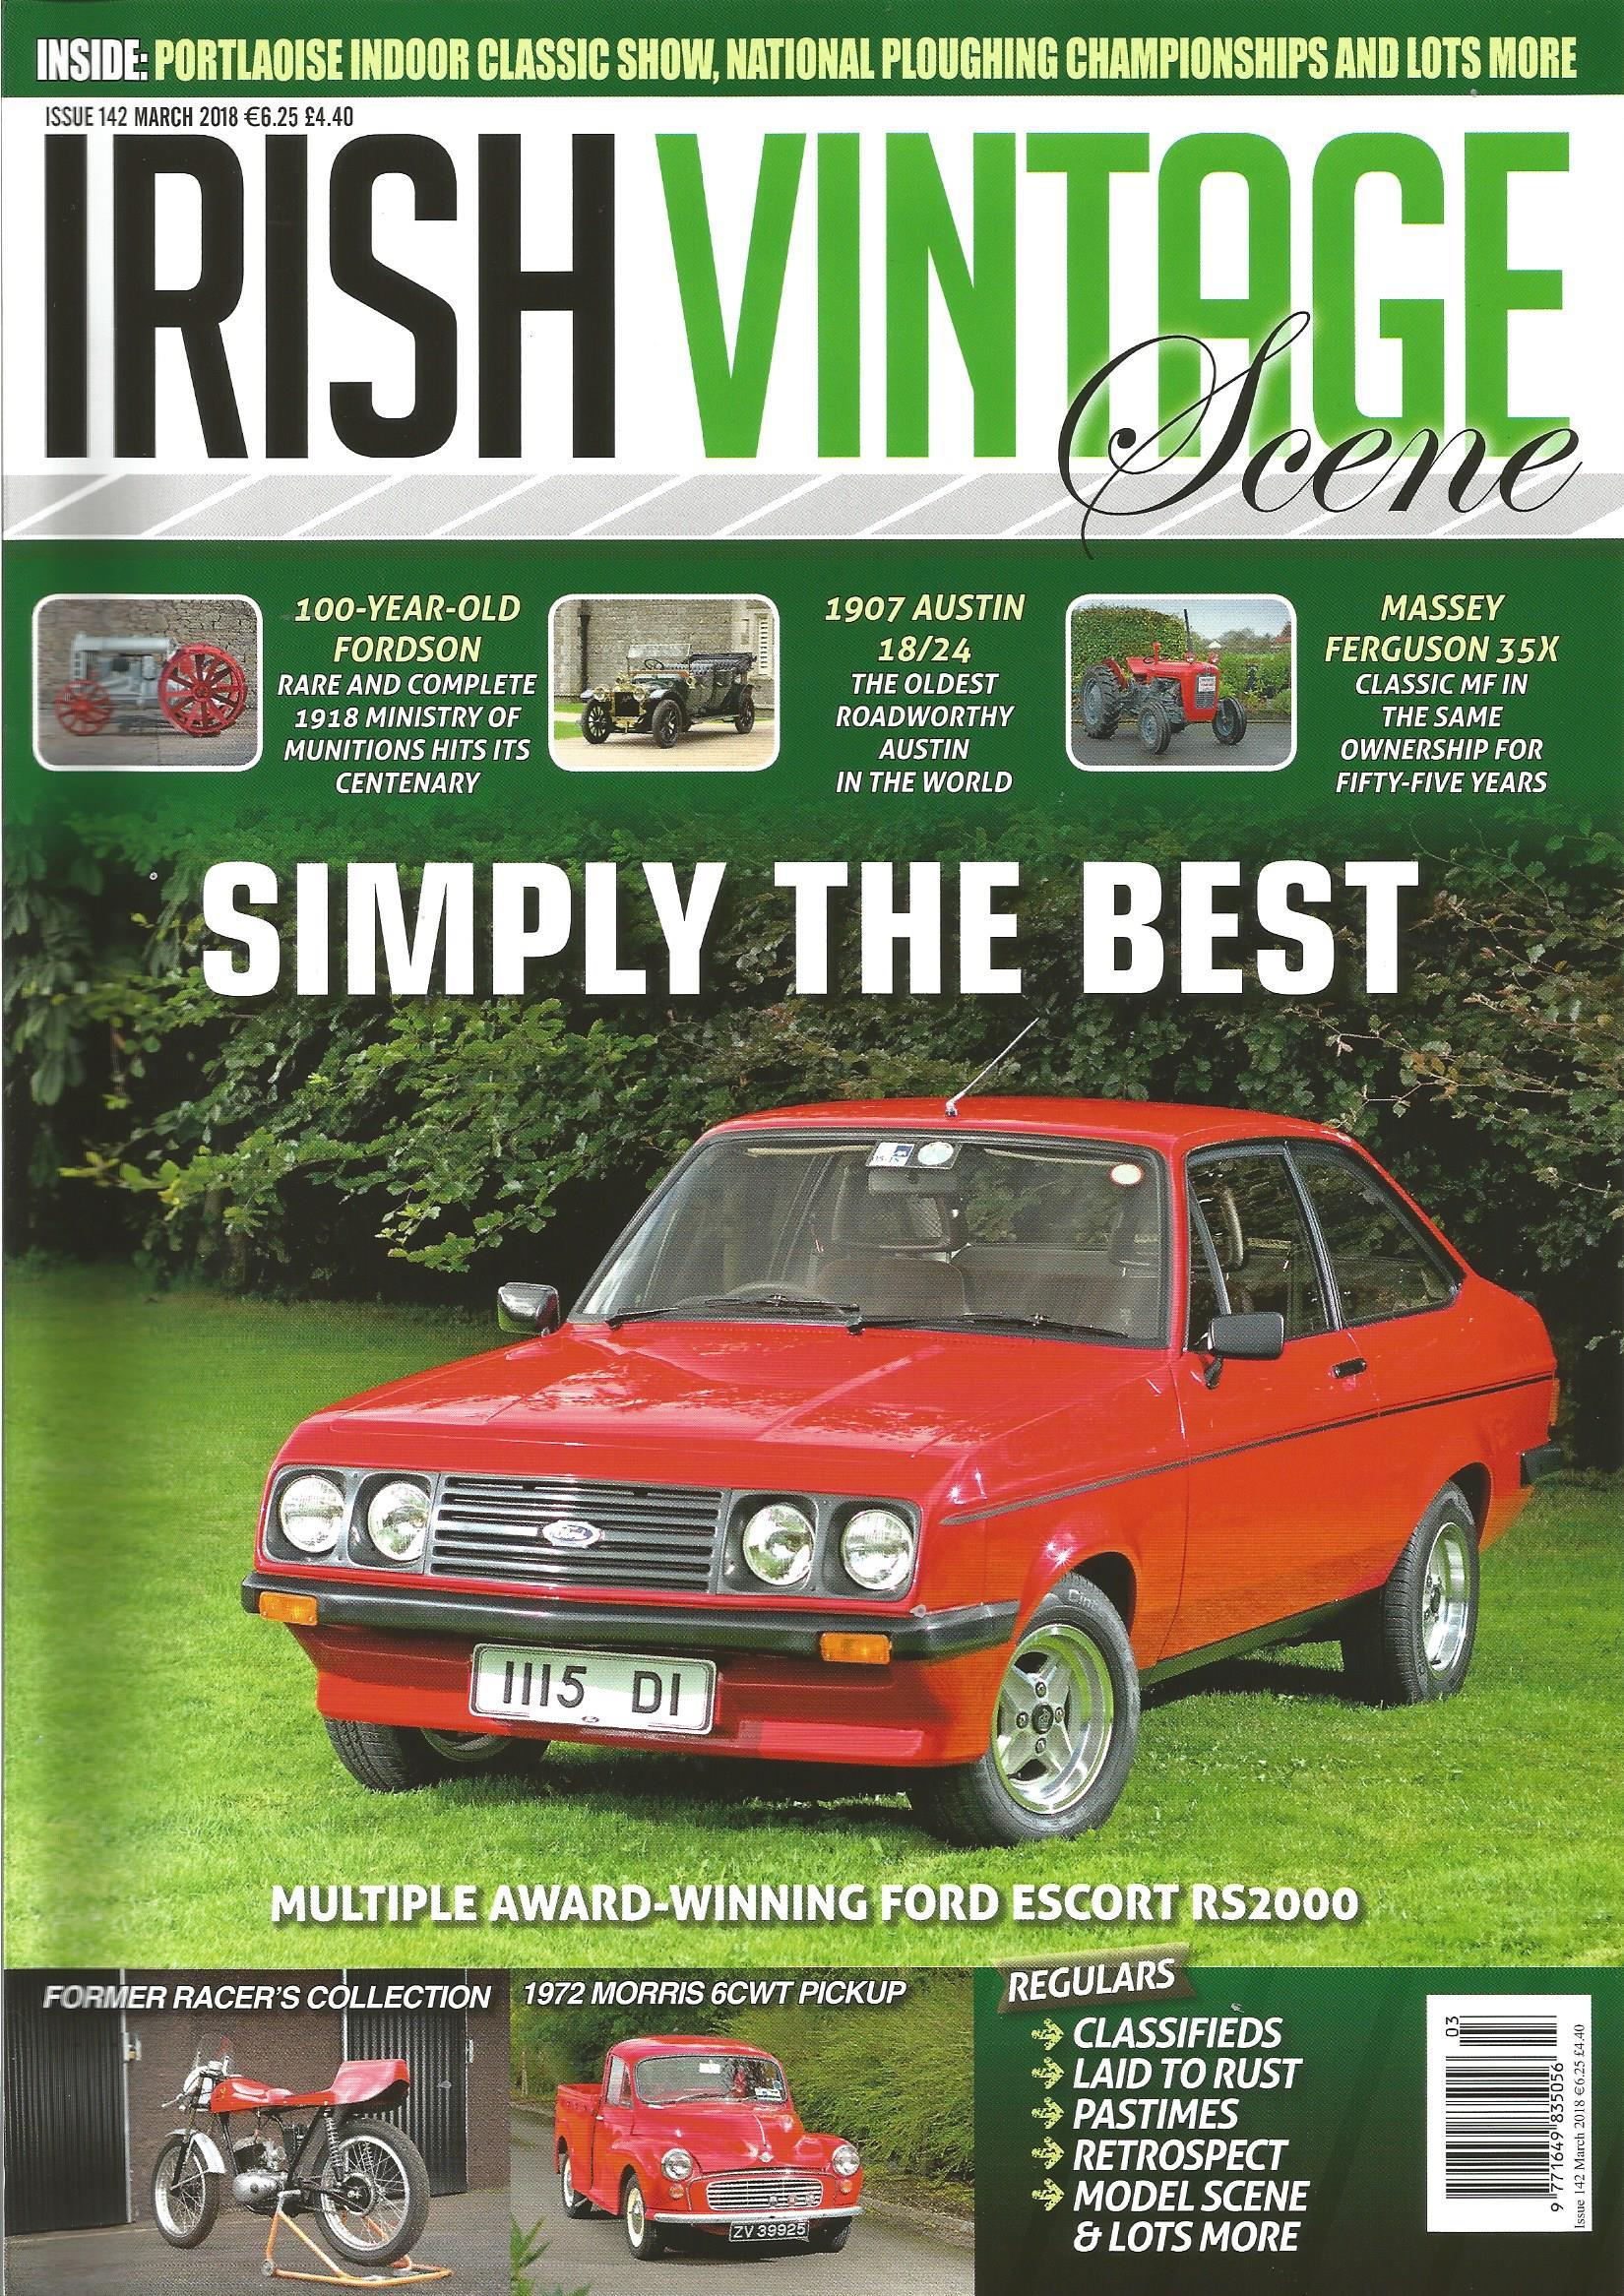 Kilkenny Motor Club Vintage Car Club Kilkenny Ireland News - Classic car lots near me